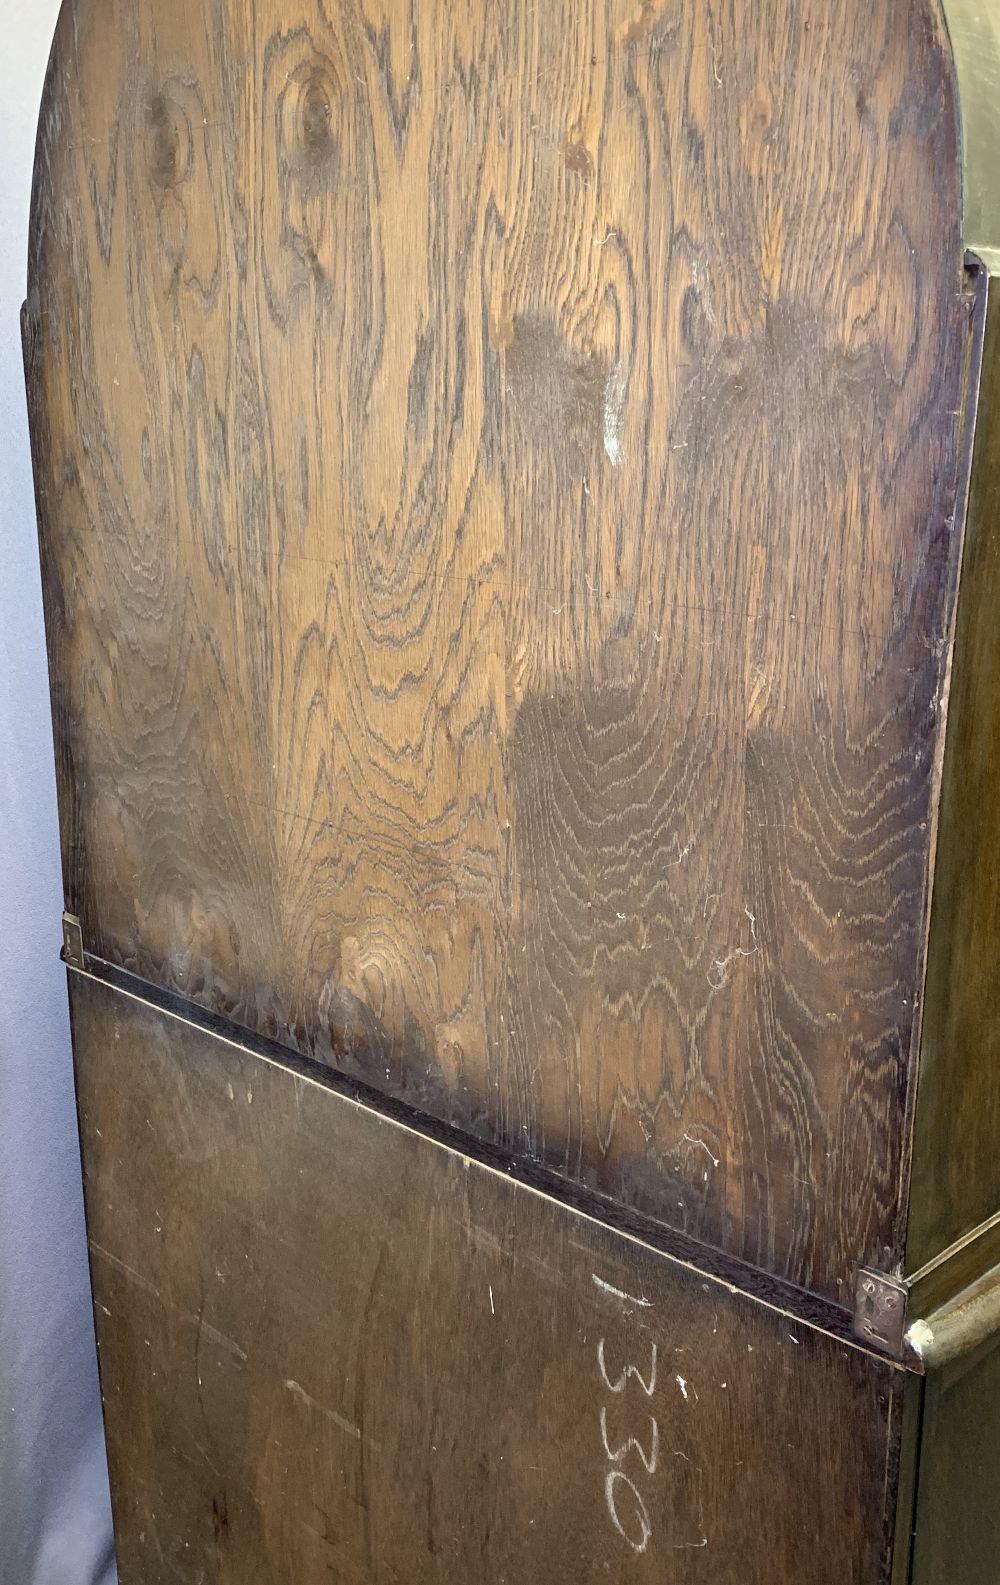 VINTAGE OAK DUTCH TOP DRESSER and an oak barley twist gateleg dining table, 191cms overall H, 96. - Image 4 of 5